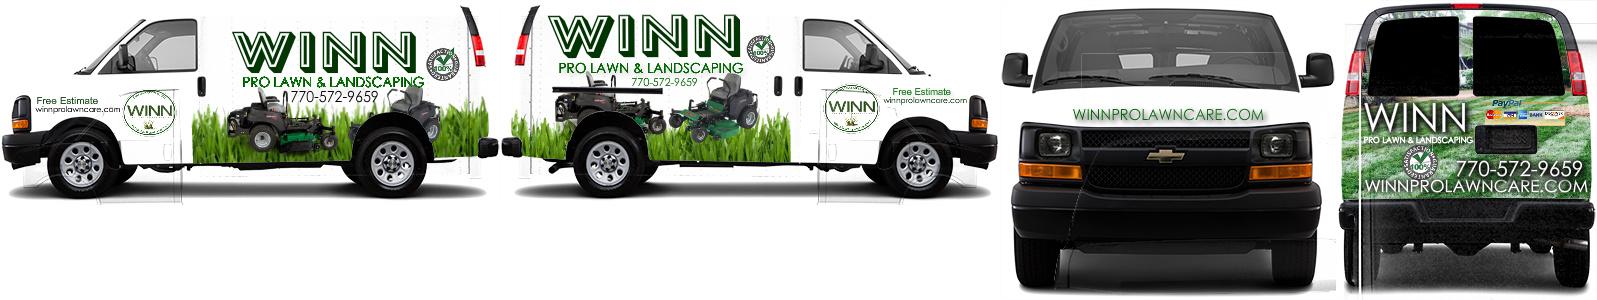 Cargo van wrap custom design 22506 by winn pro lawn for Garden maintenance van